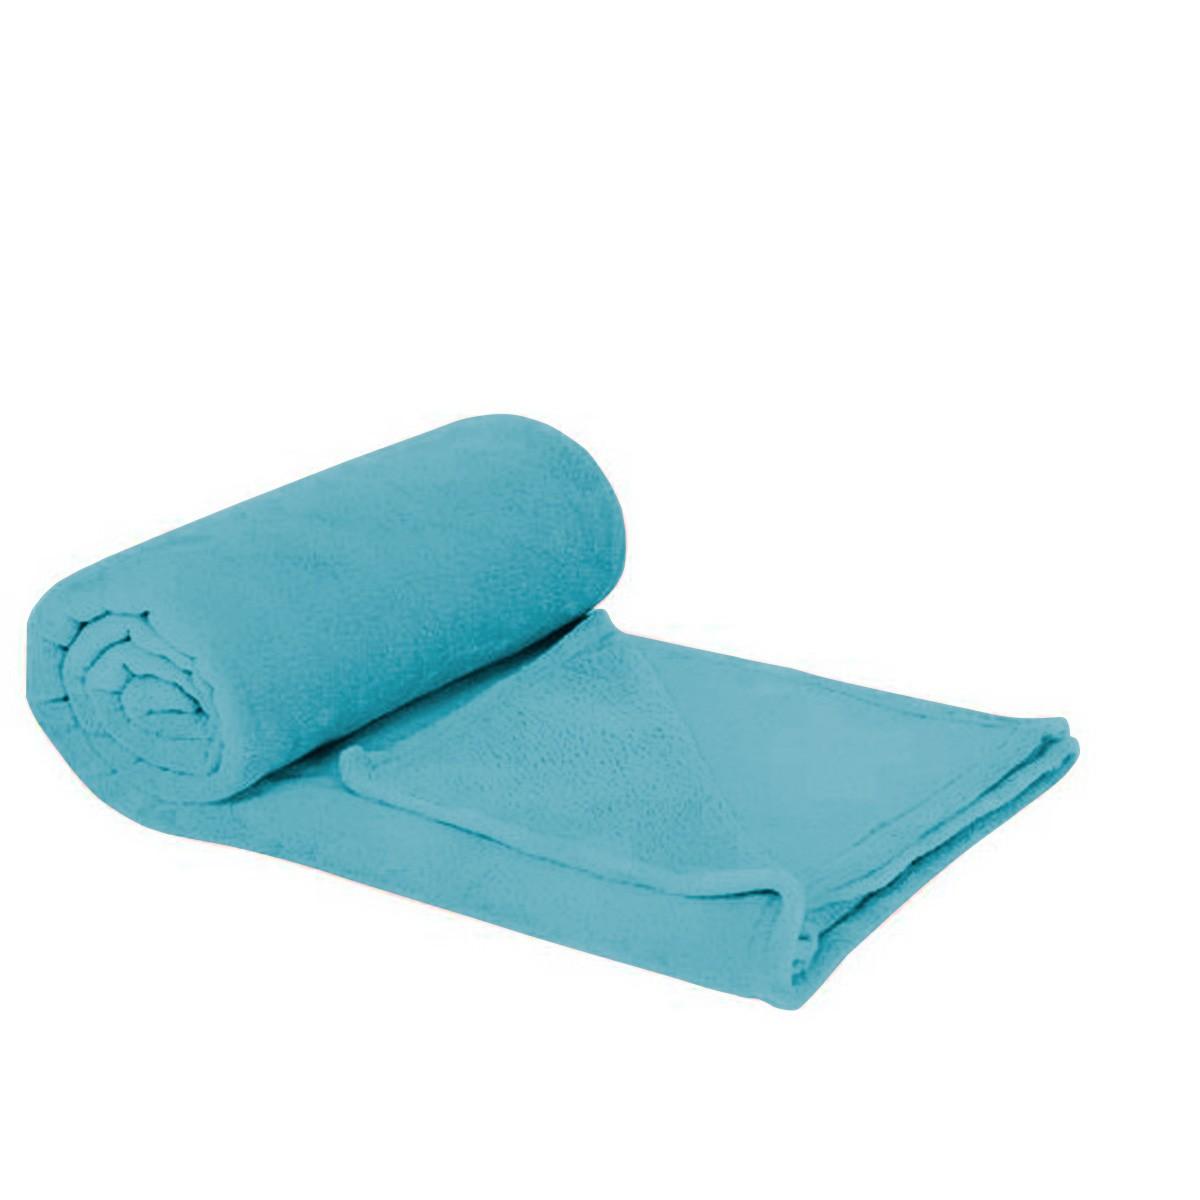 Manta Cobertor Sofisticata Queen 220x240 ESMERALDA